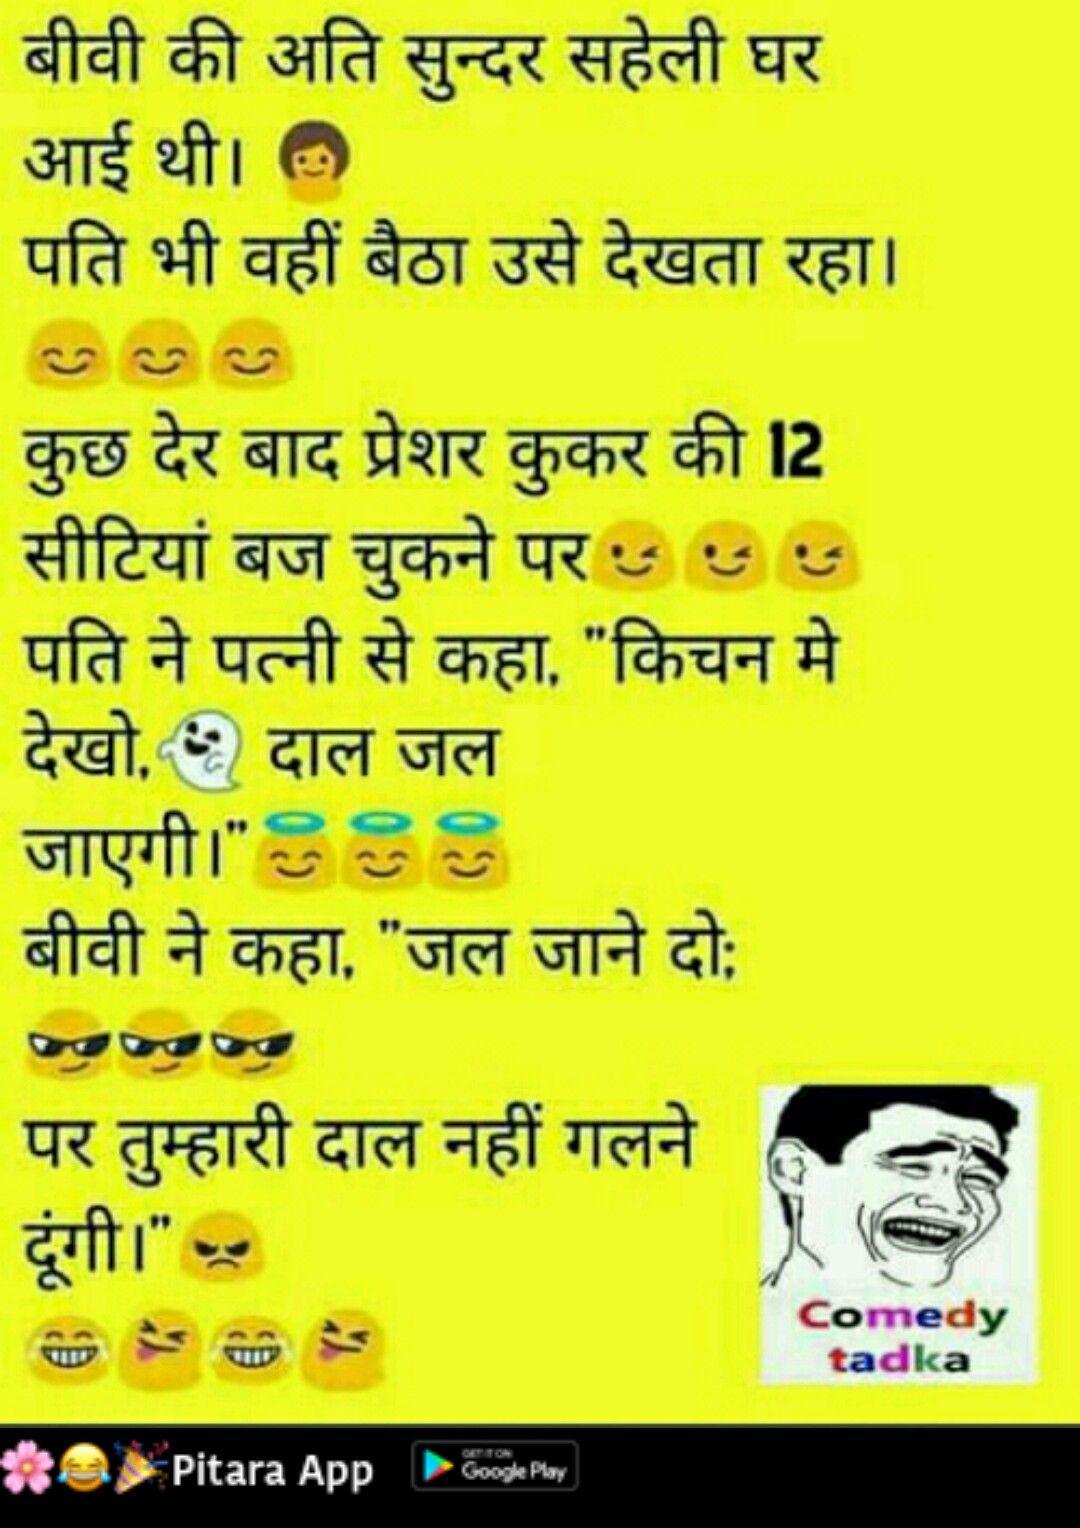 Follow Me For More Shreshthi Sen Some Funny Jokes